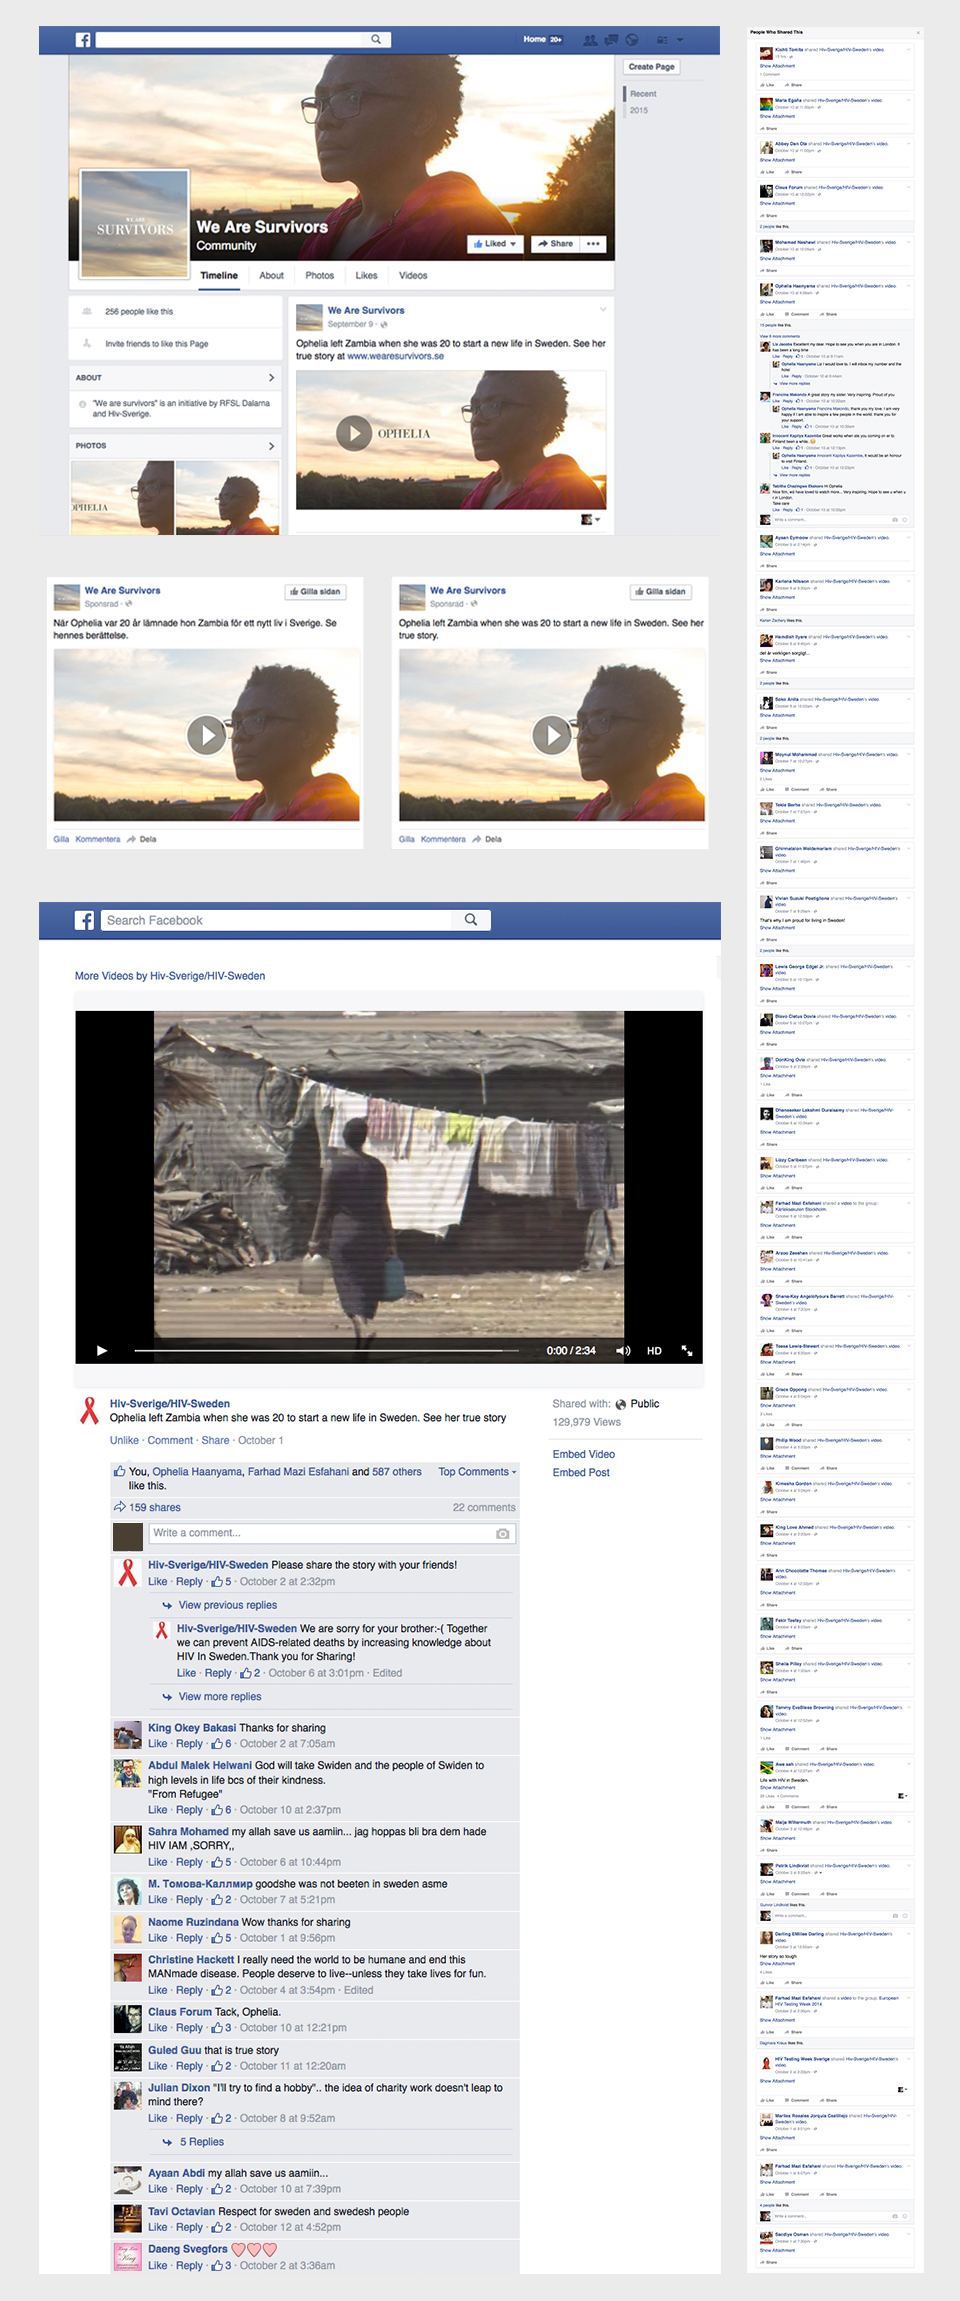 We Are Survivors Facebook